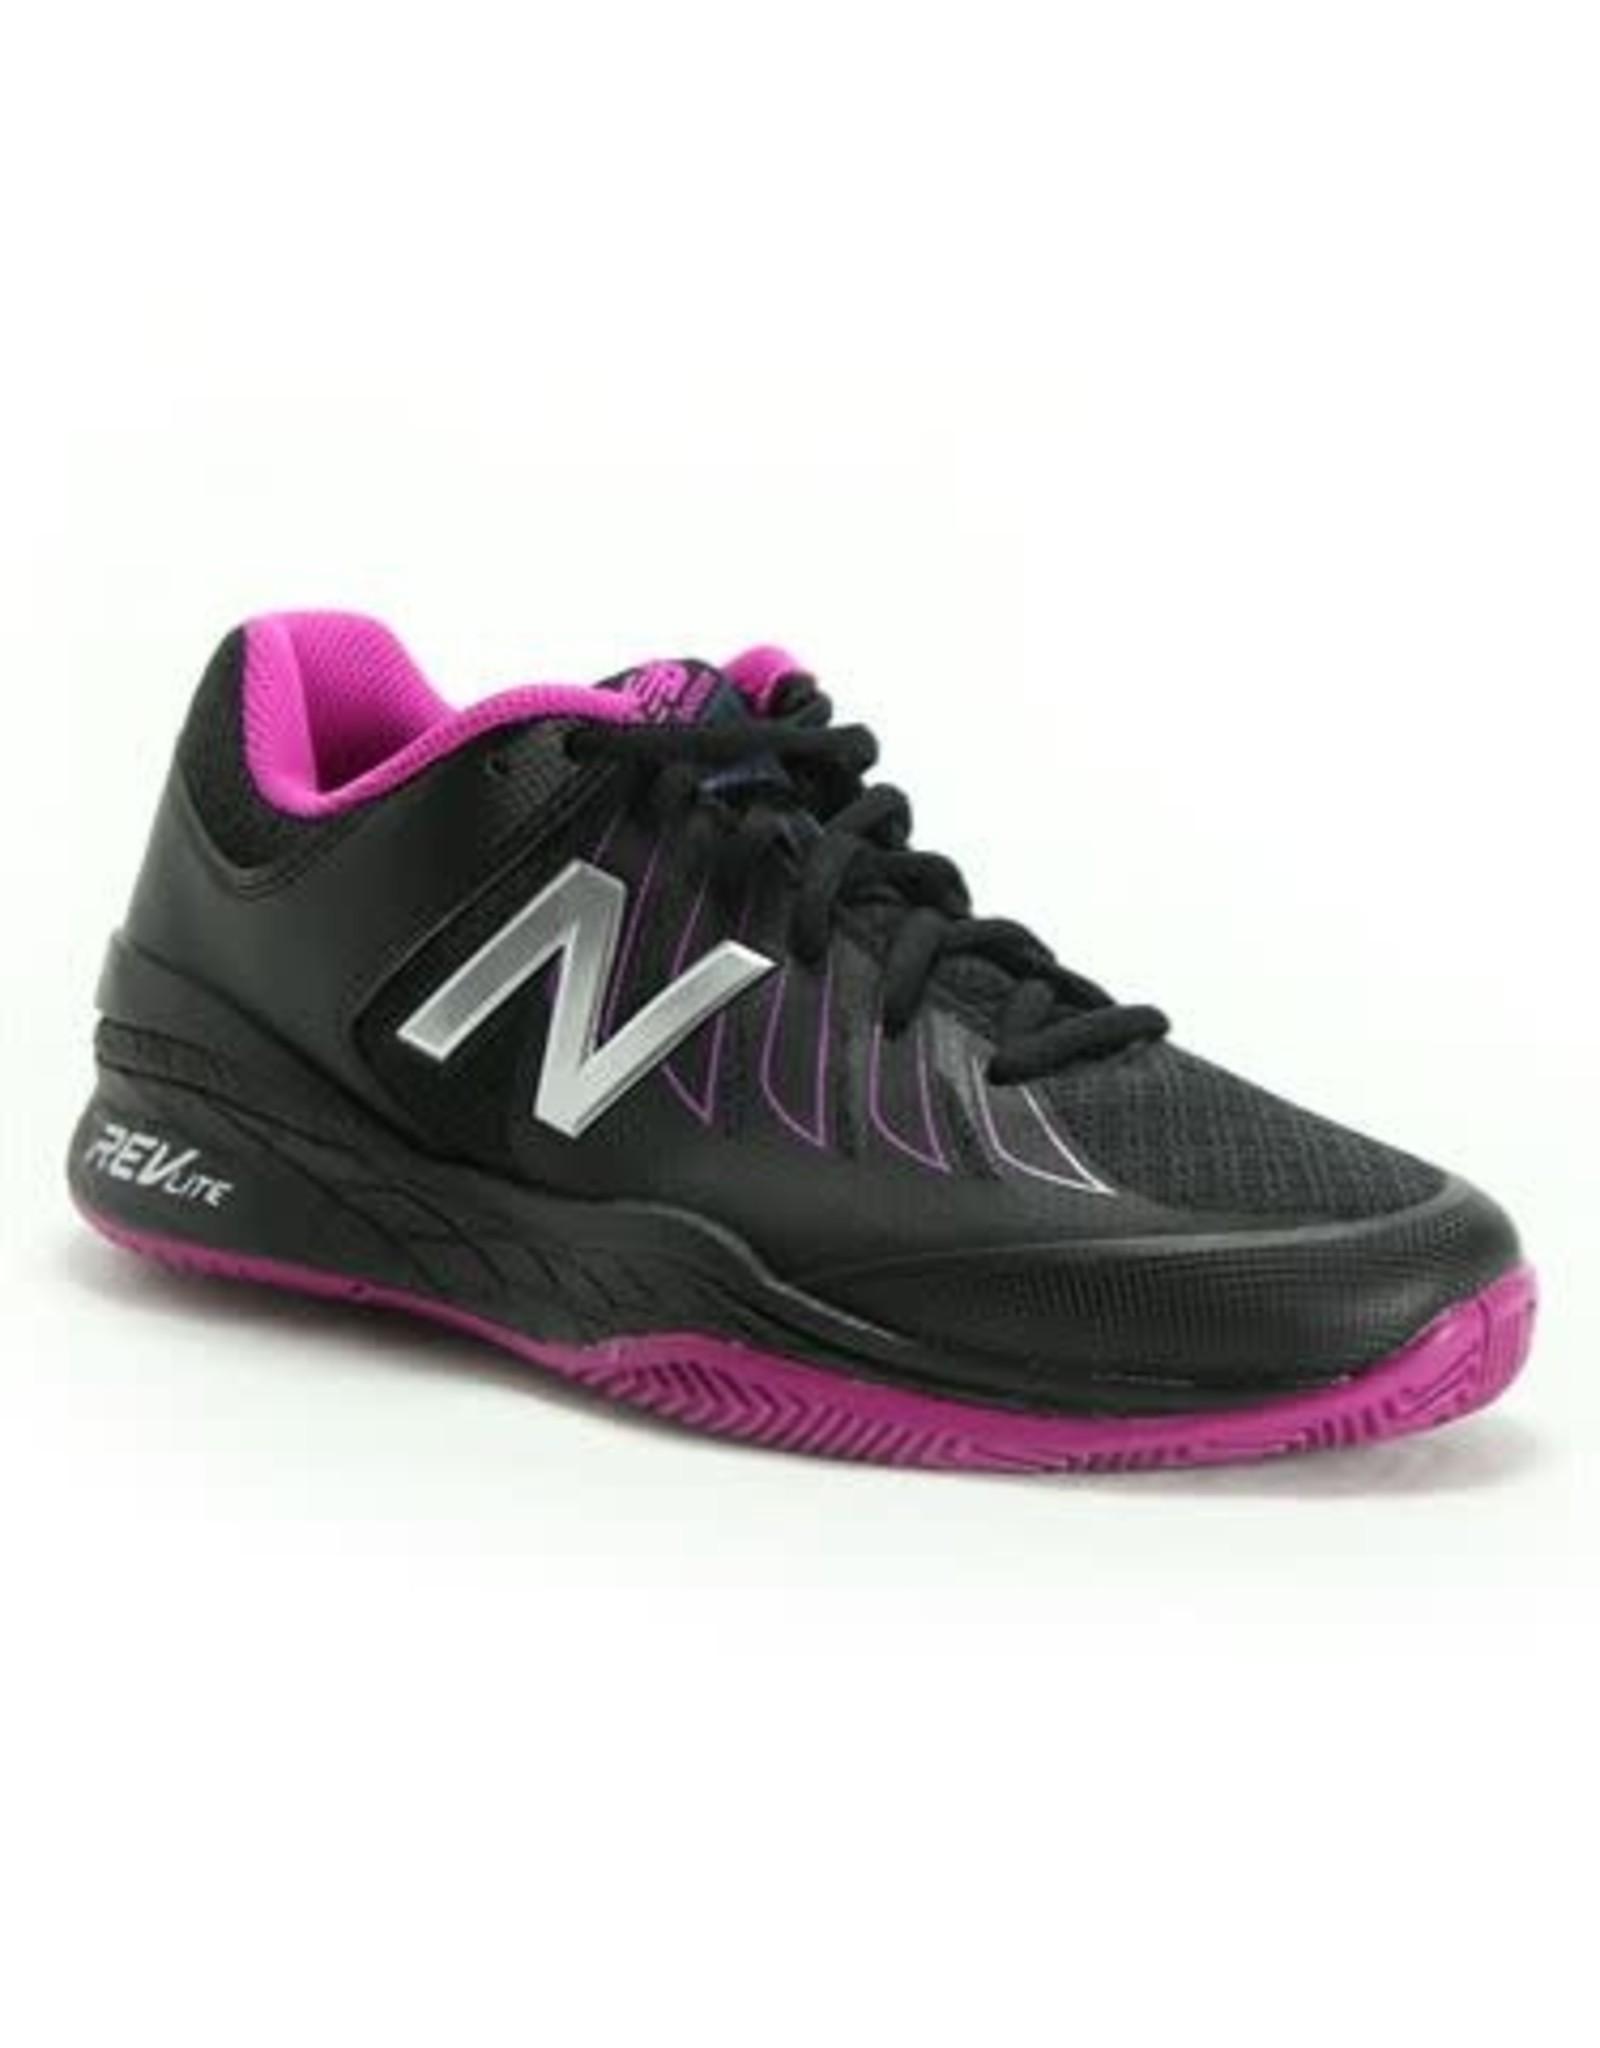 New Balance New Balance WC1006WR Tennis Shoe